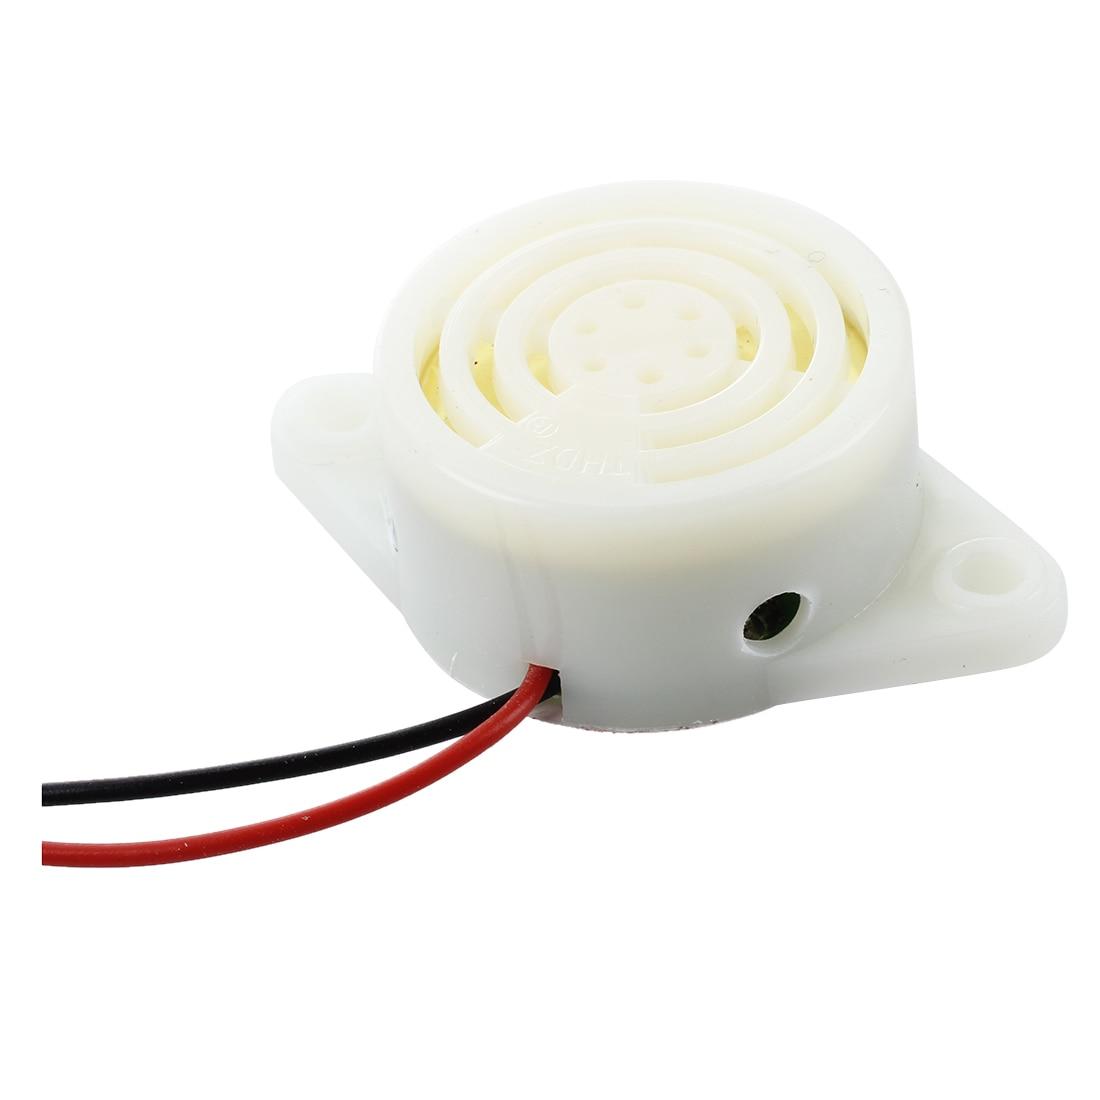 2 * HYT - 3015 B DC 3 - 24 V 80 decibel sound intermittent buzzer piezo